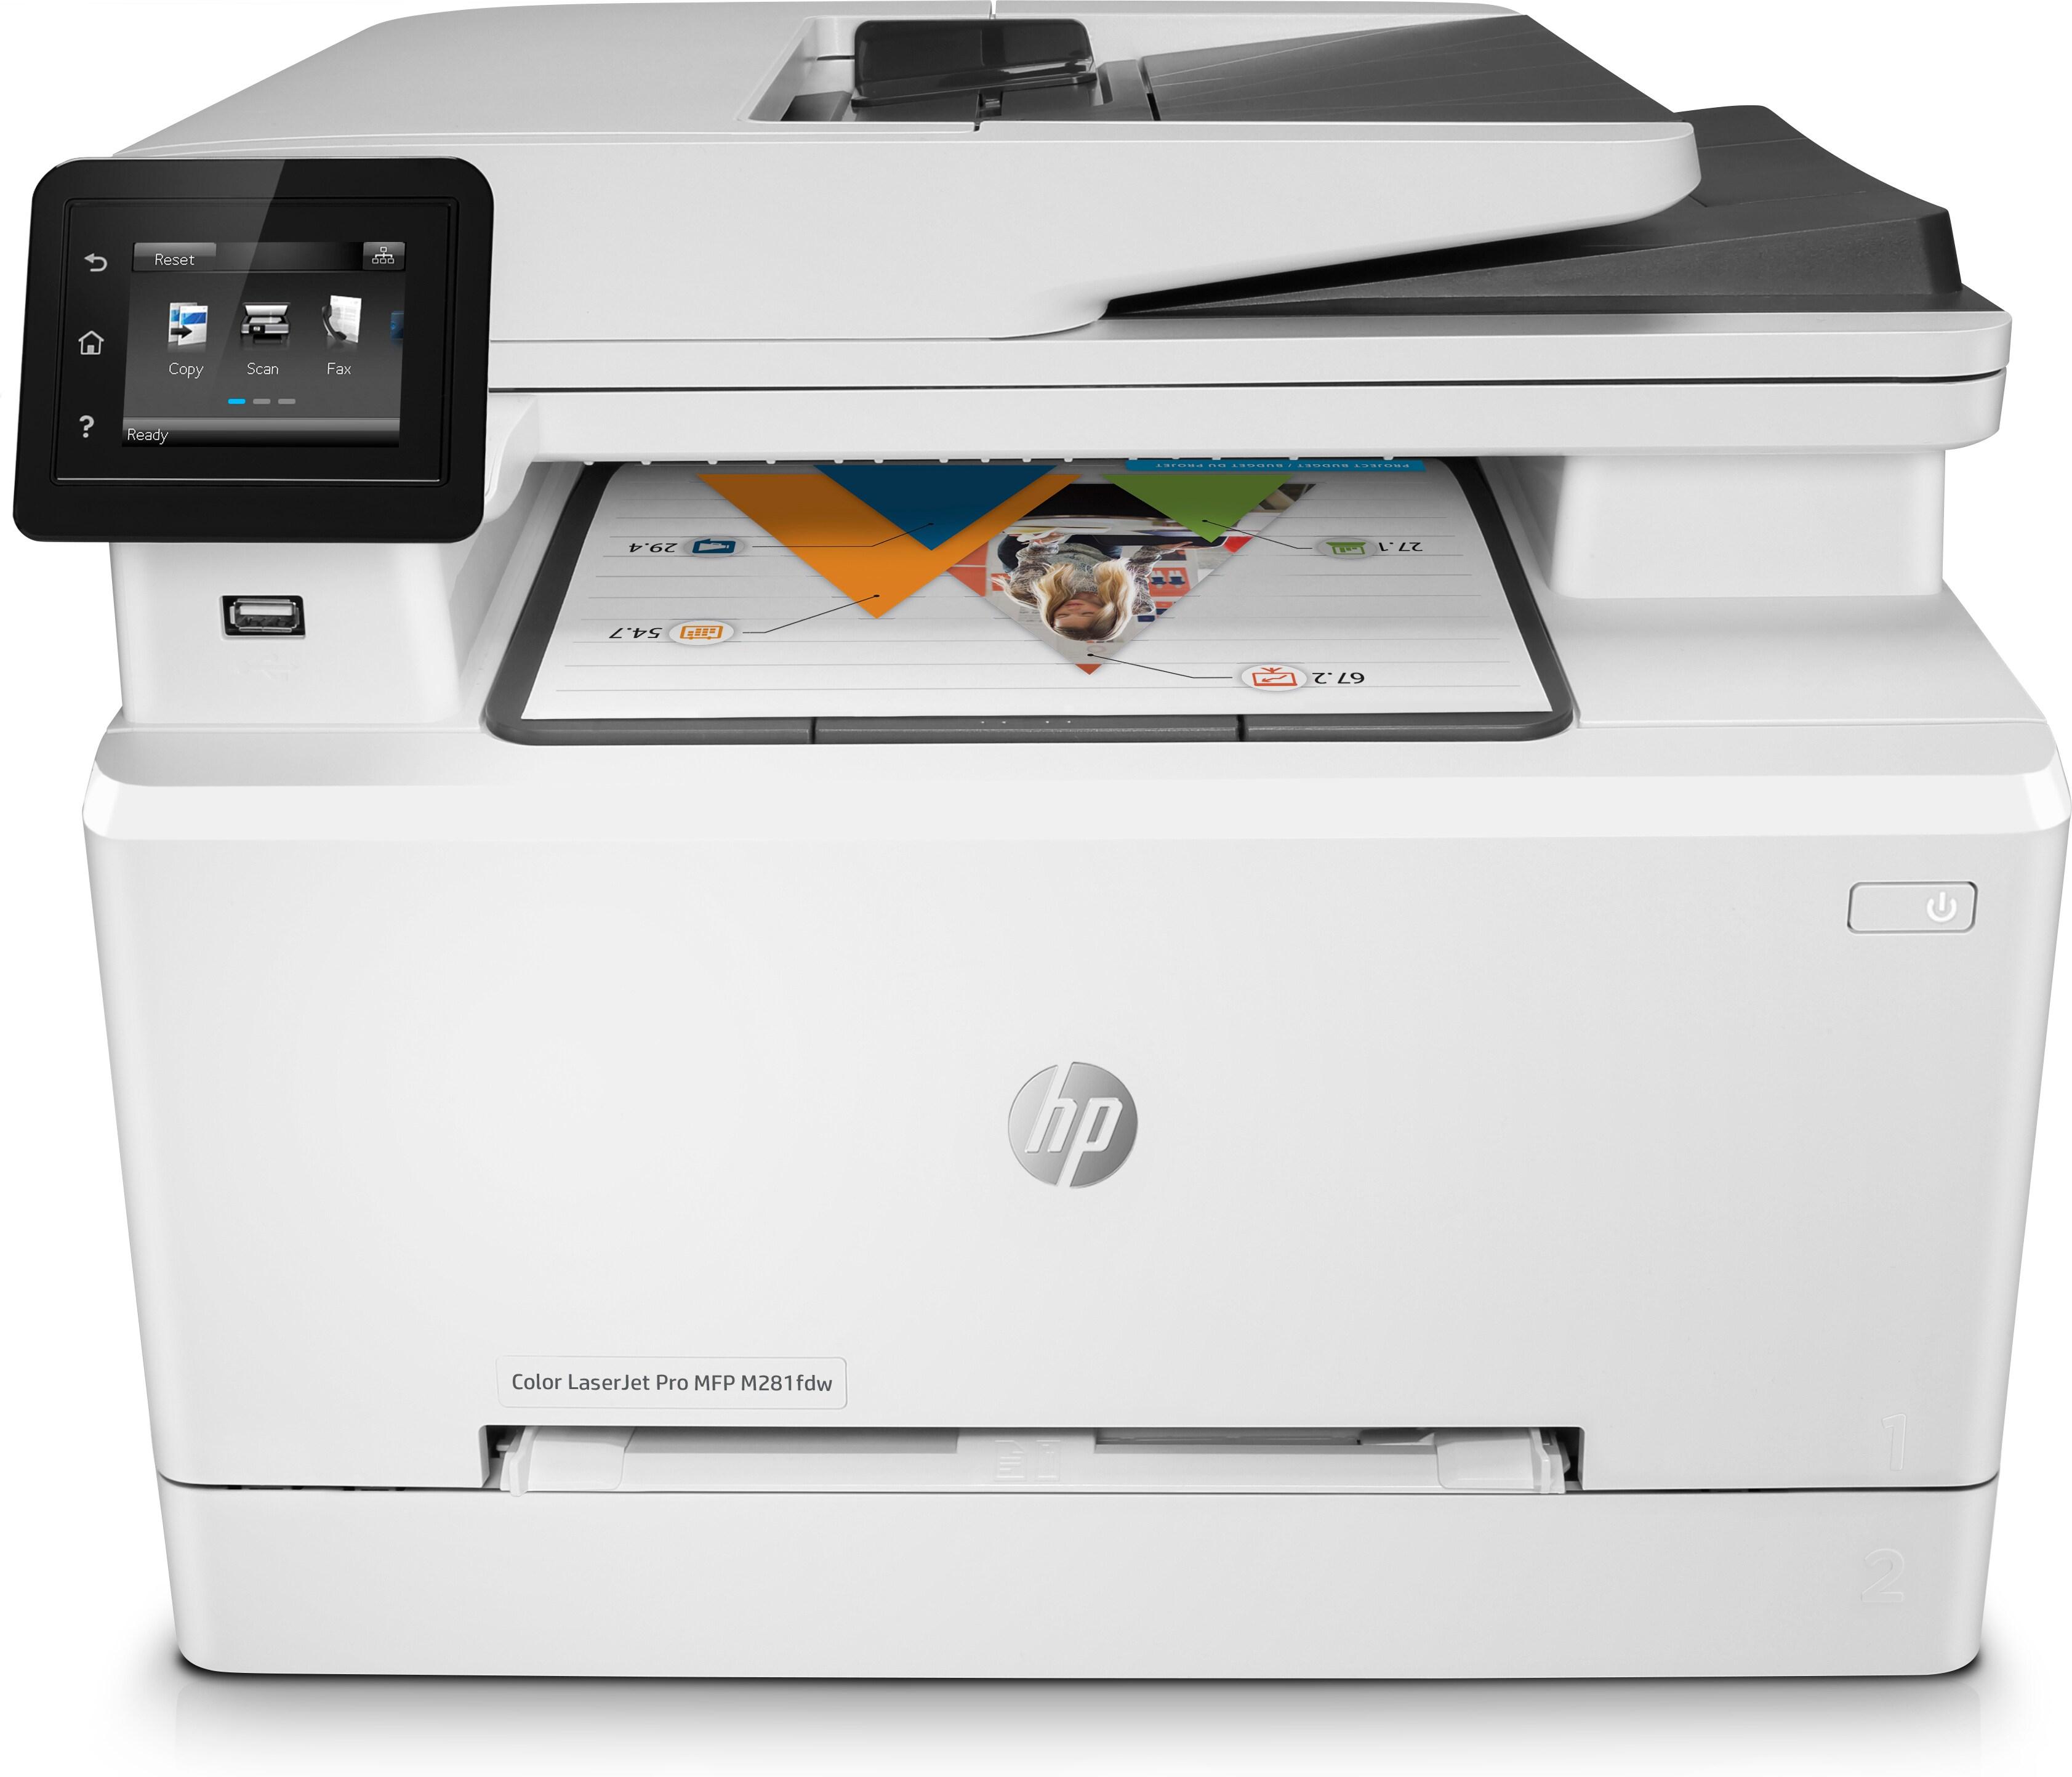 T6B82A HP Color Laserjet Pro MFP M281fdw A4 Colour Multifunction Laser Printer - Refurbished